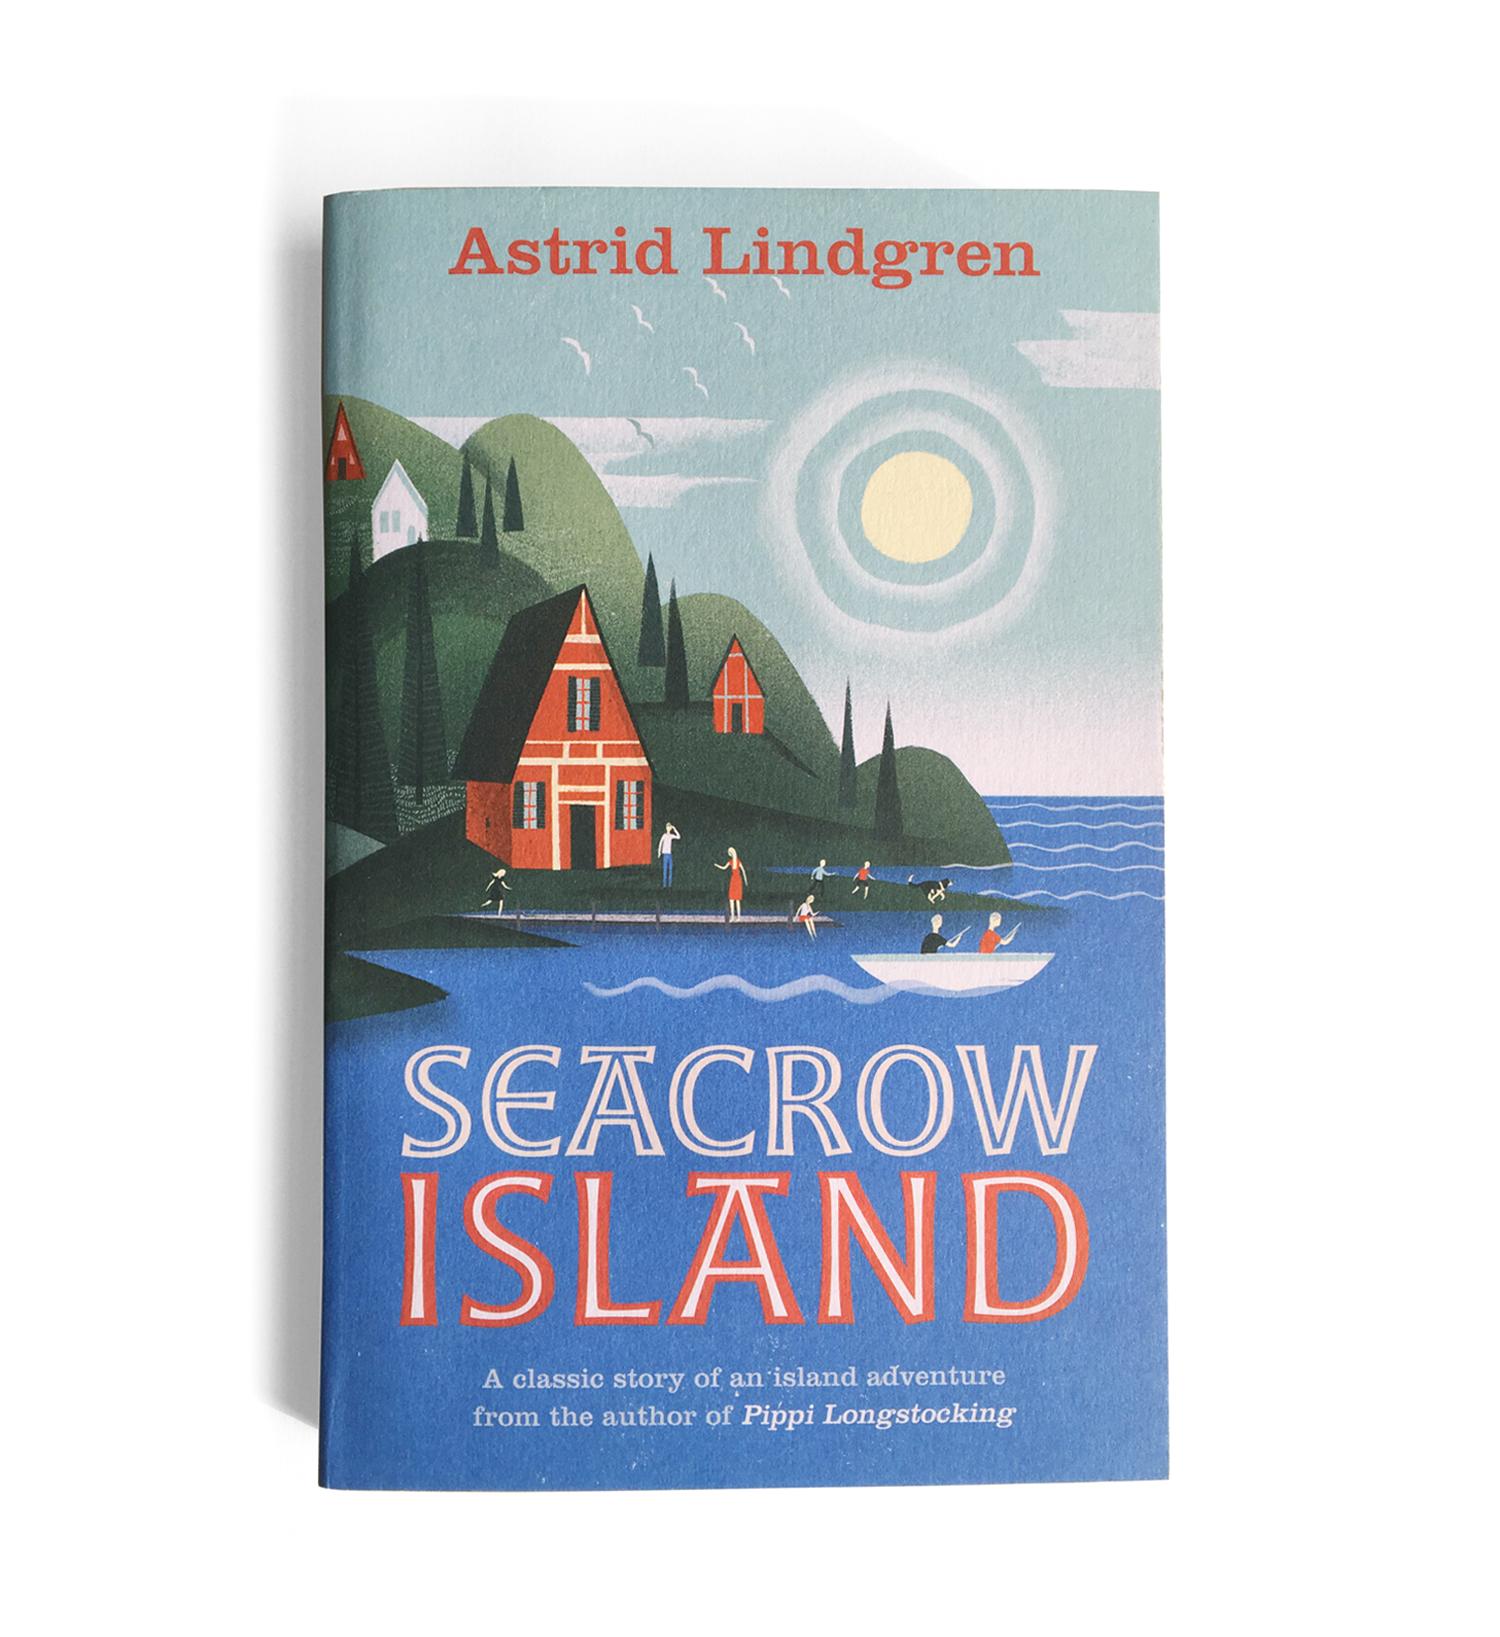 Seacrow Island - Oxford University Press, 2016